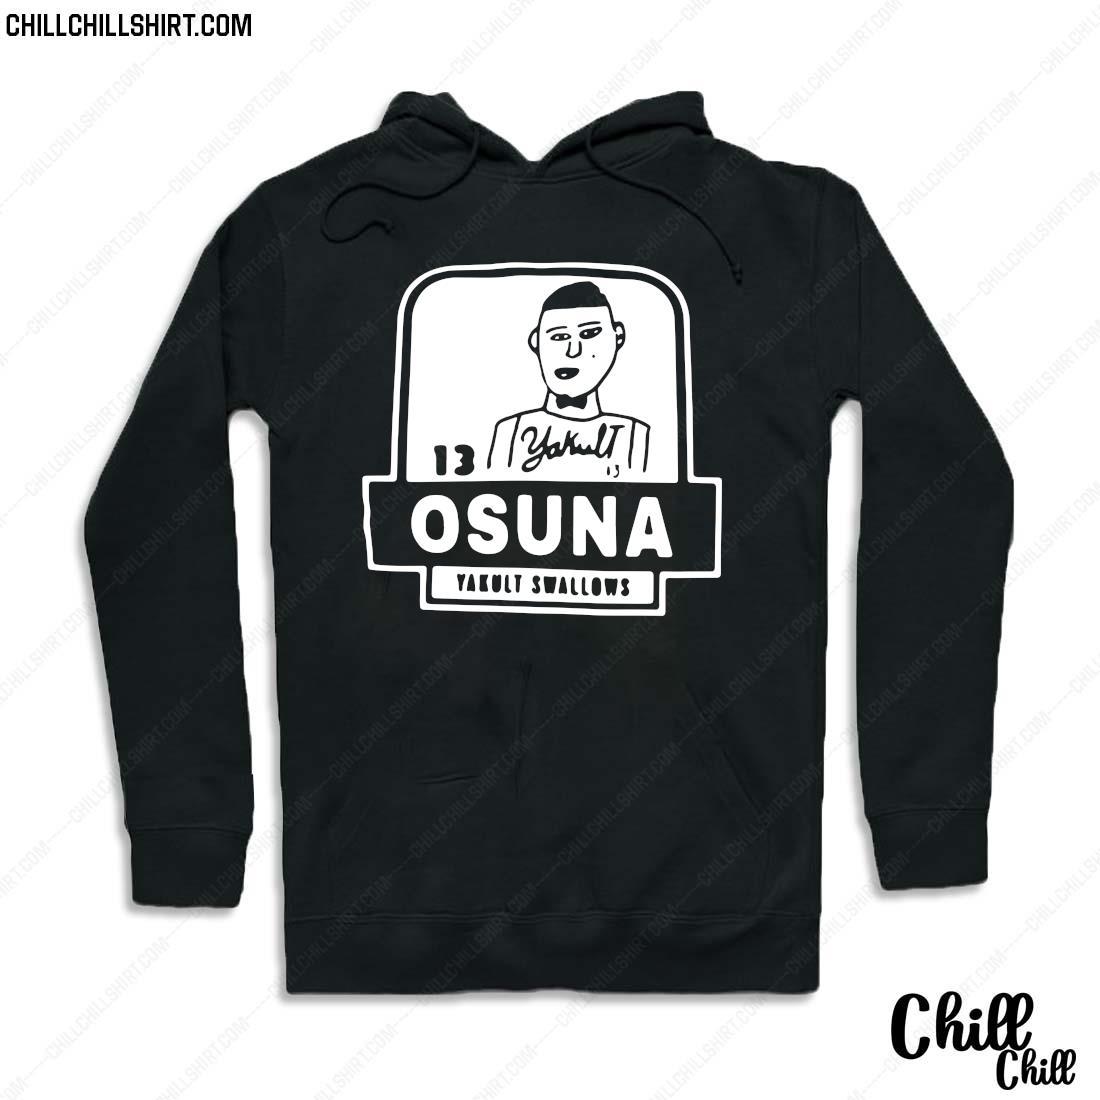 13 Yakult Osuna Yakult Swallows Shirt Hoodie